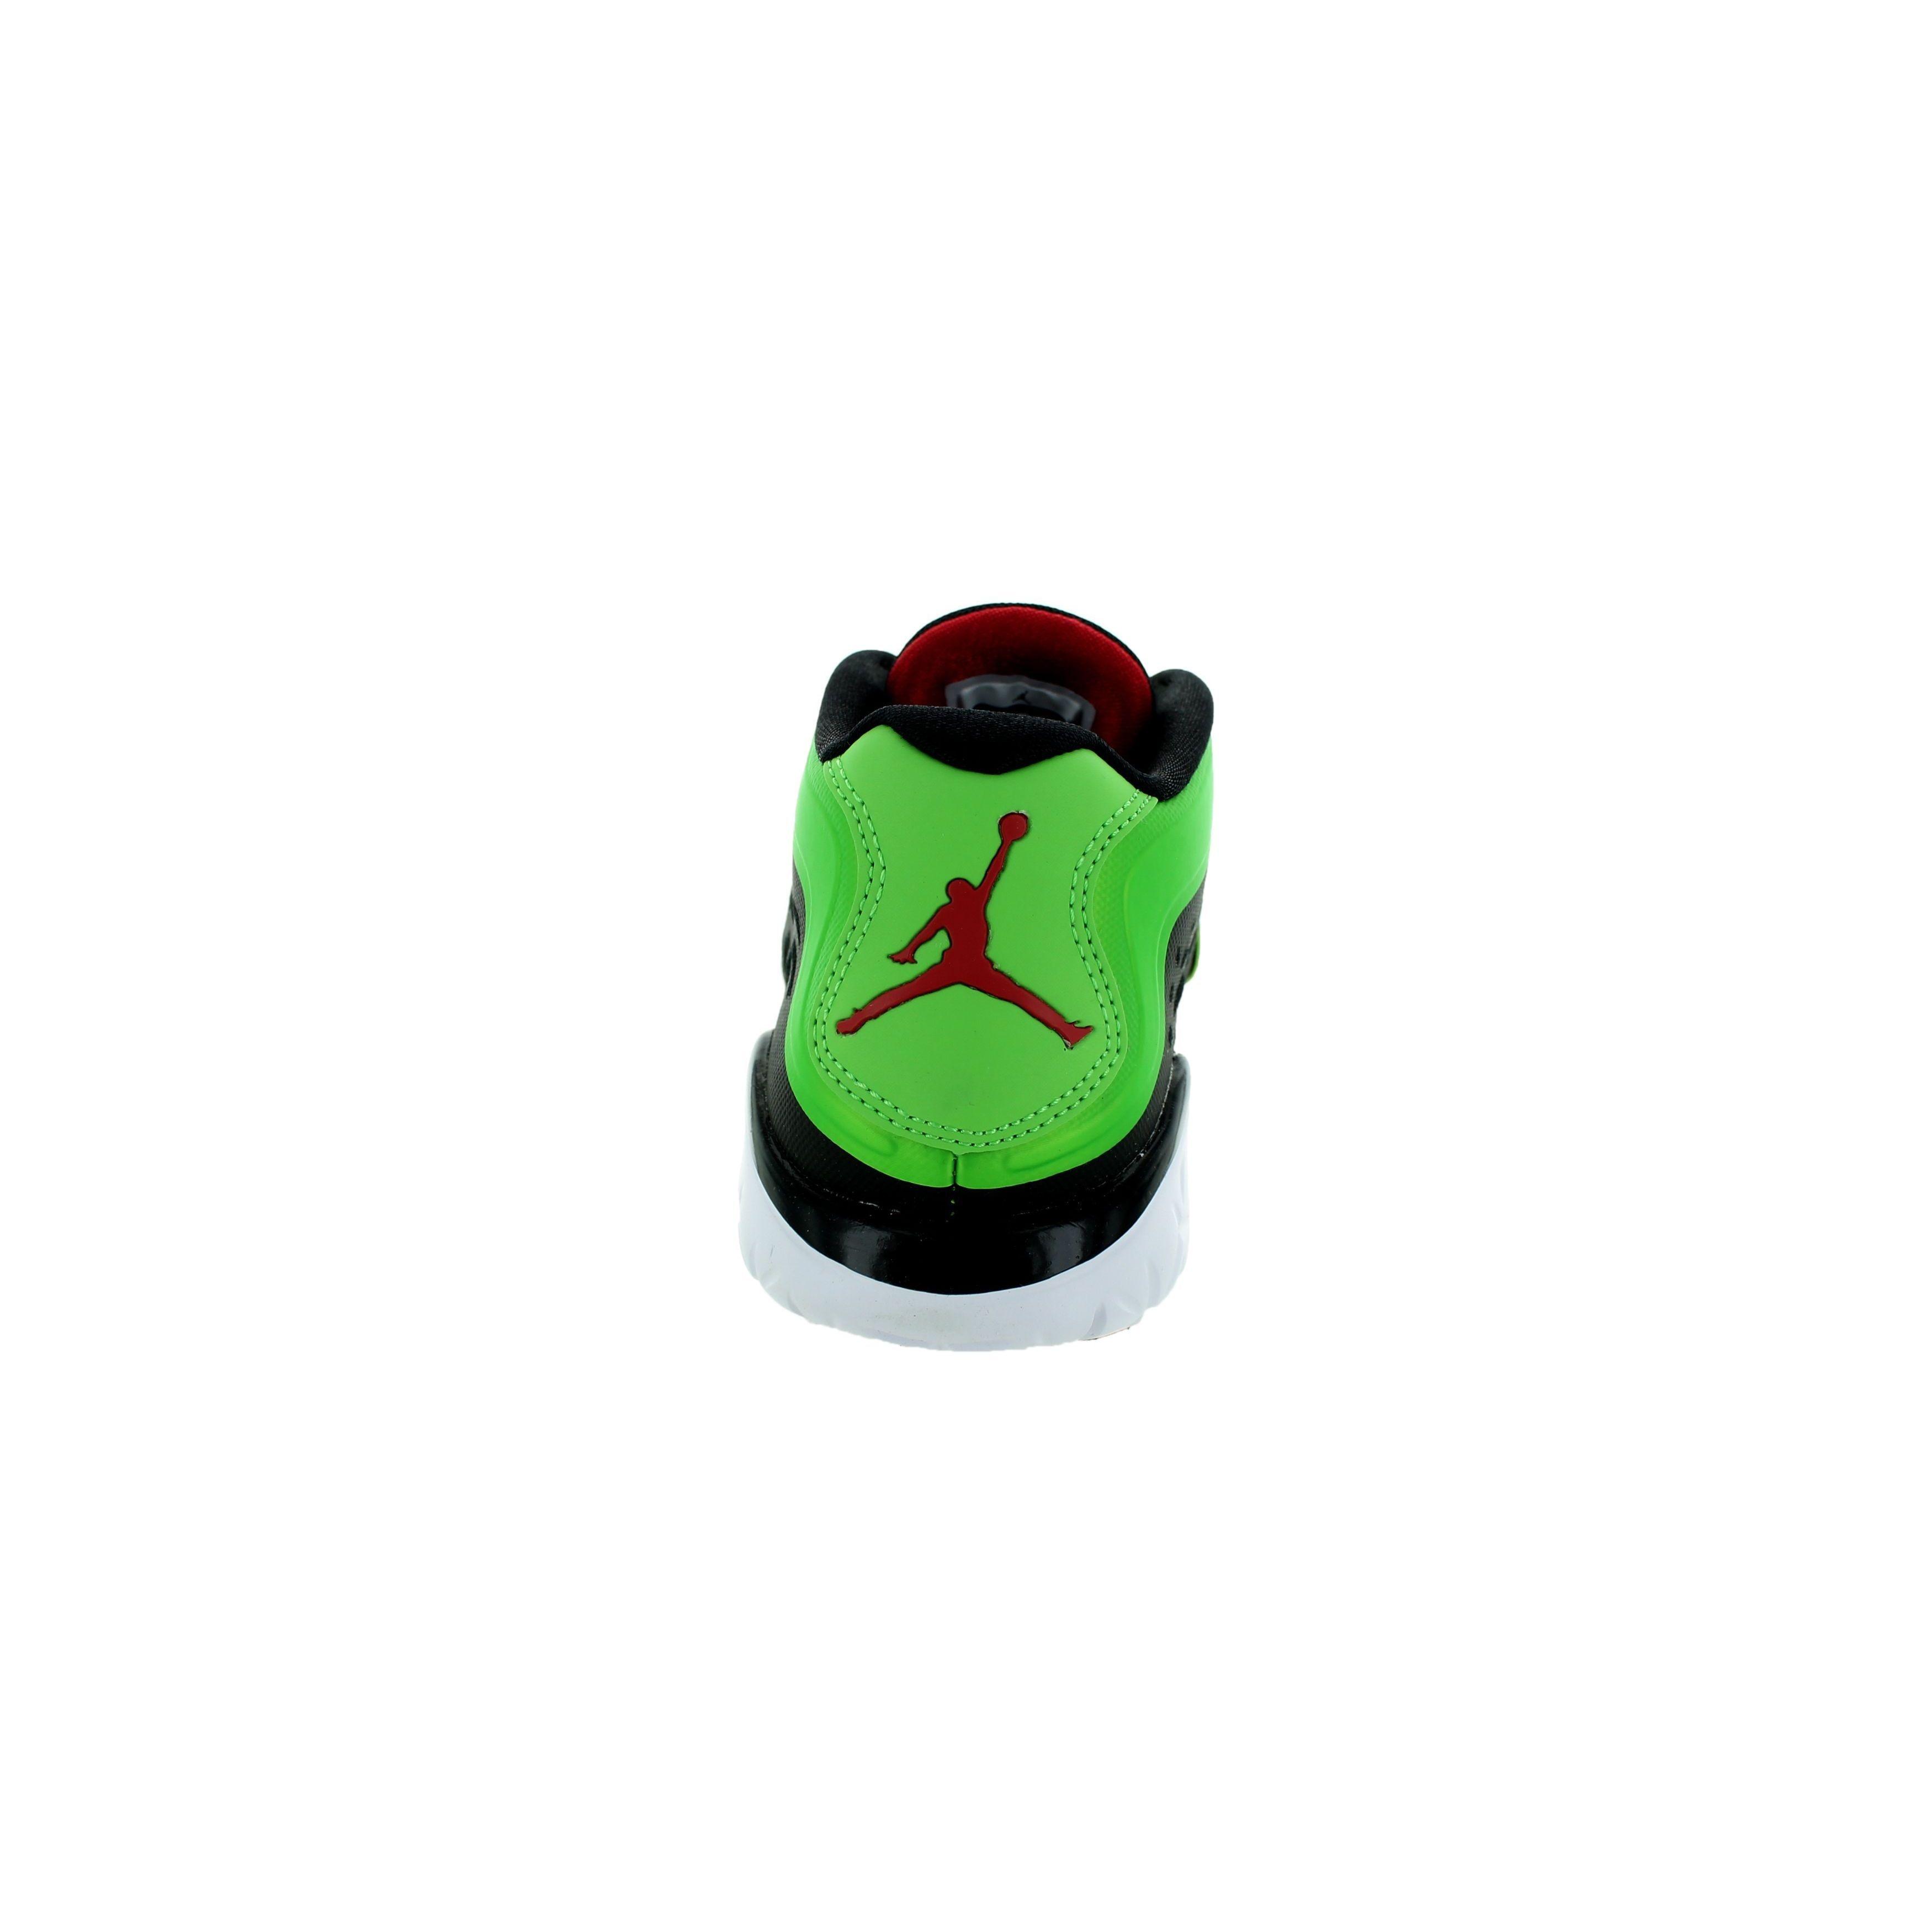 309f58f310d46 Shop Nike Jordan Men s Flight Flex Trainer 2 Black Gym Red G Pulse White  Training Shoe - Free Shipping Today - Overstock - 12362385